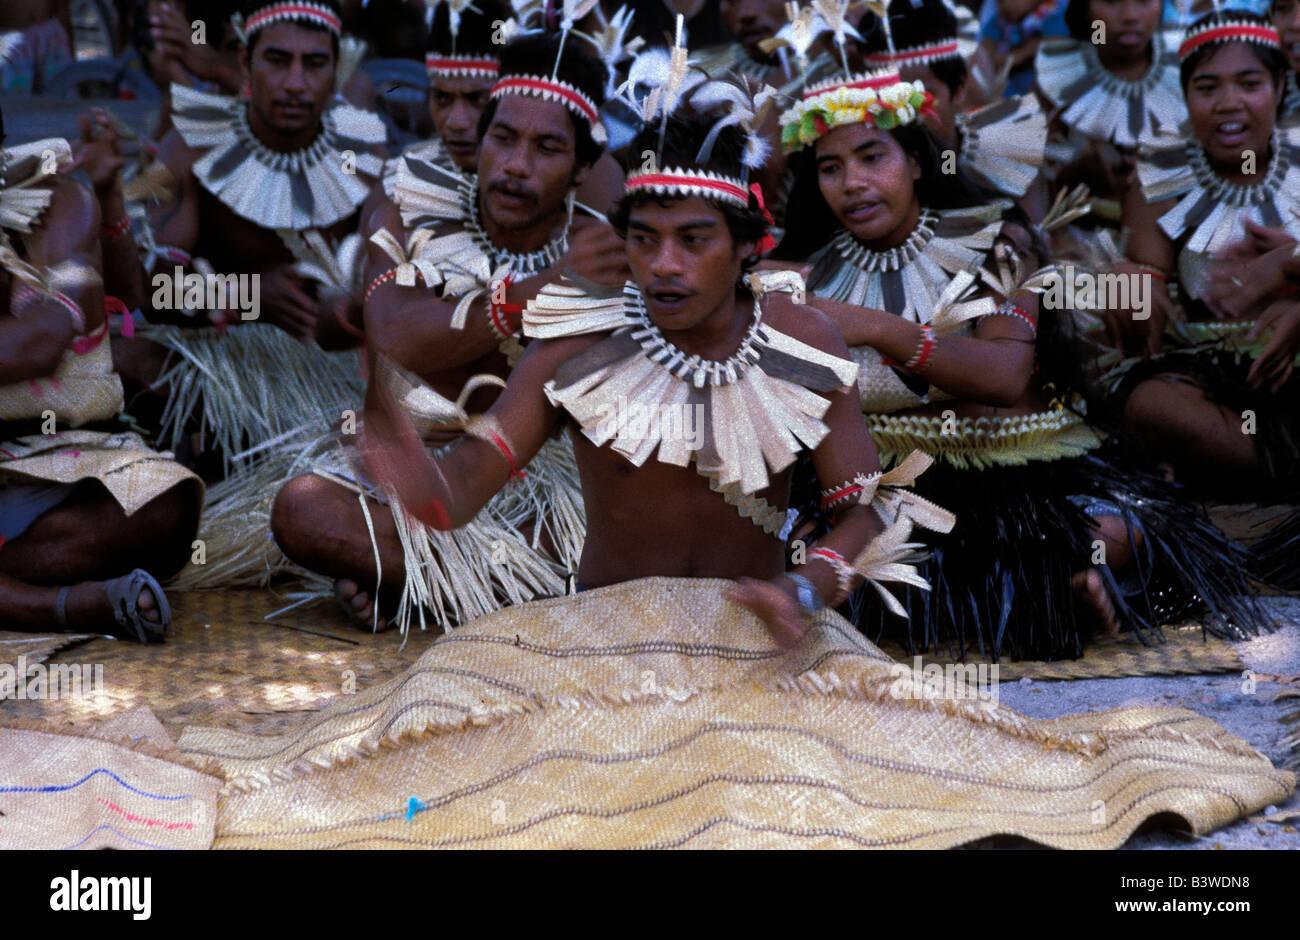 Oceania, Fanning Island, Kiribati. Residents in traditional costumes. - Stock Image